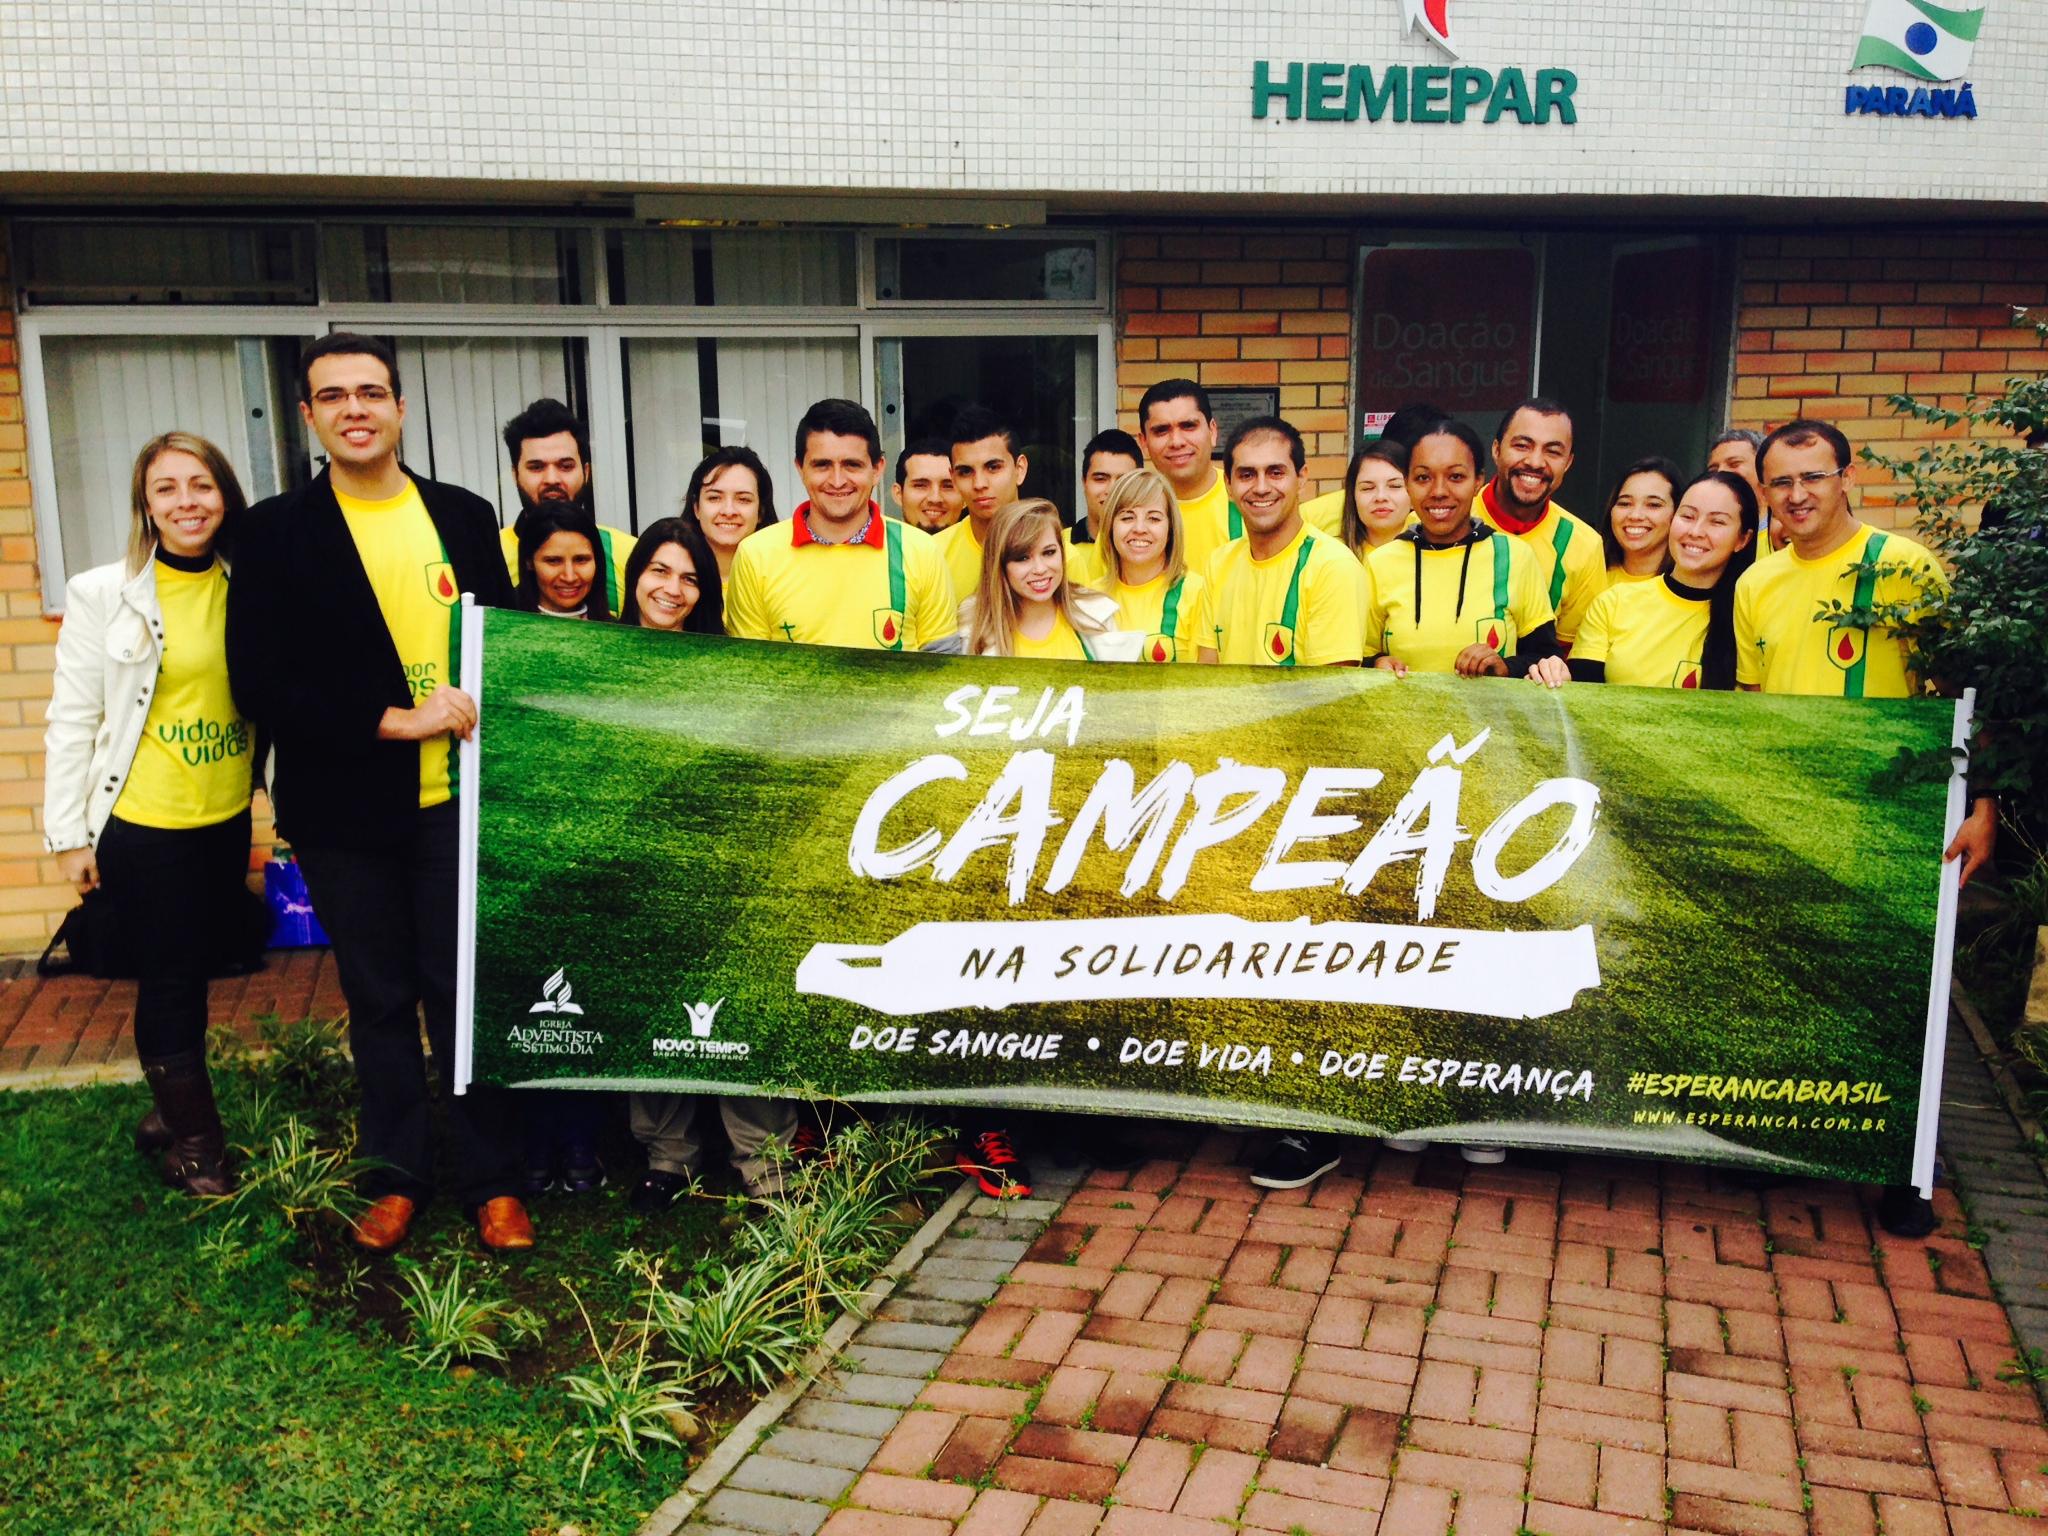 Esperança Brasil